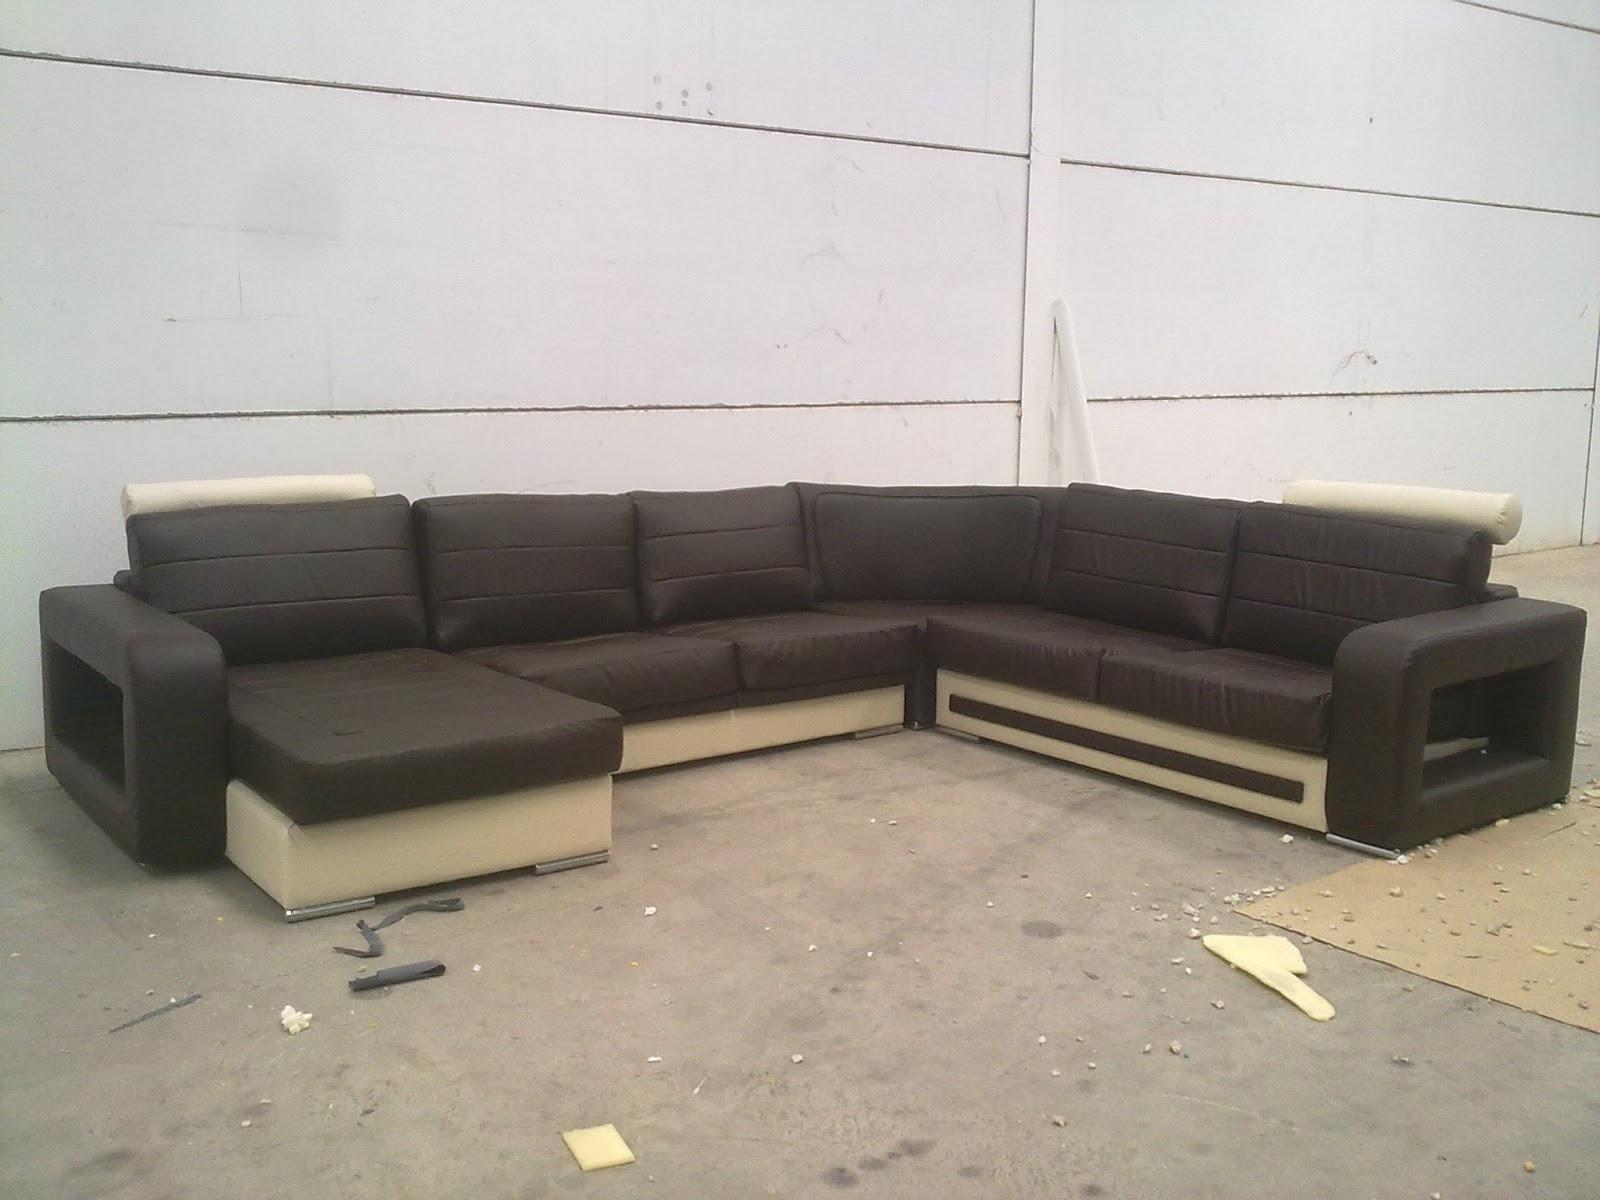 Fabricantes de chaise longue en valencia los chaise for Los sofas mas baratos